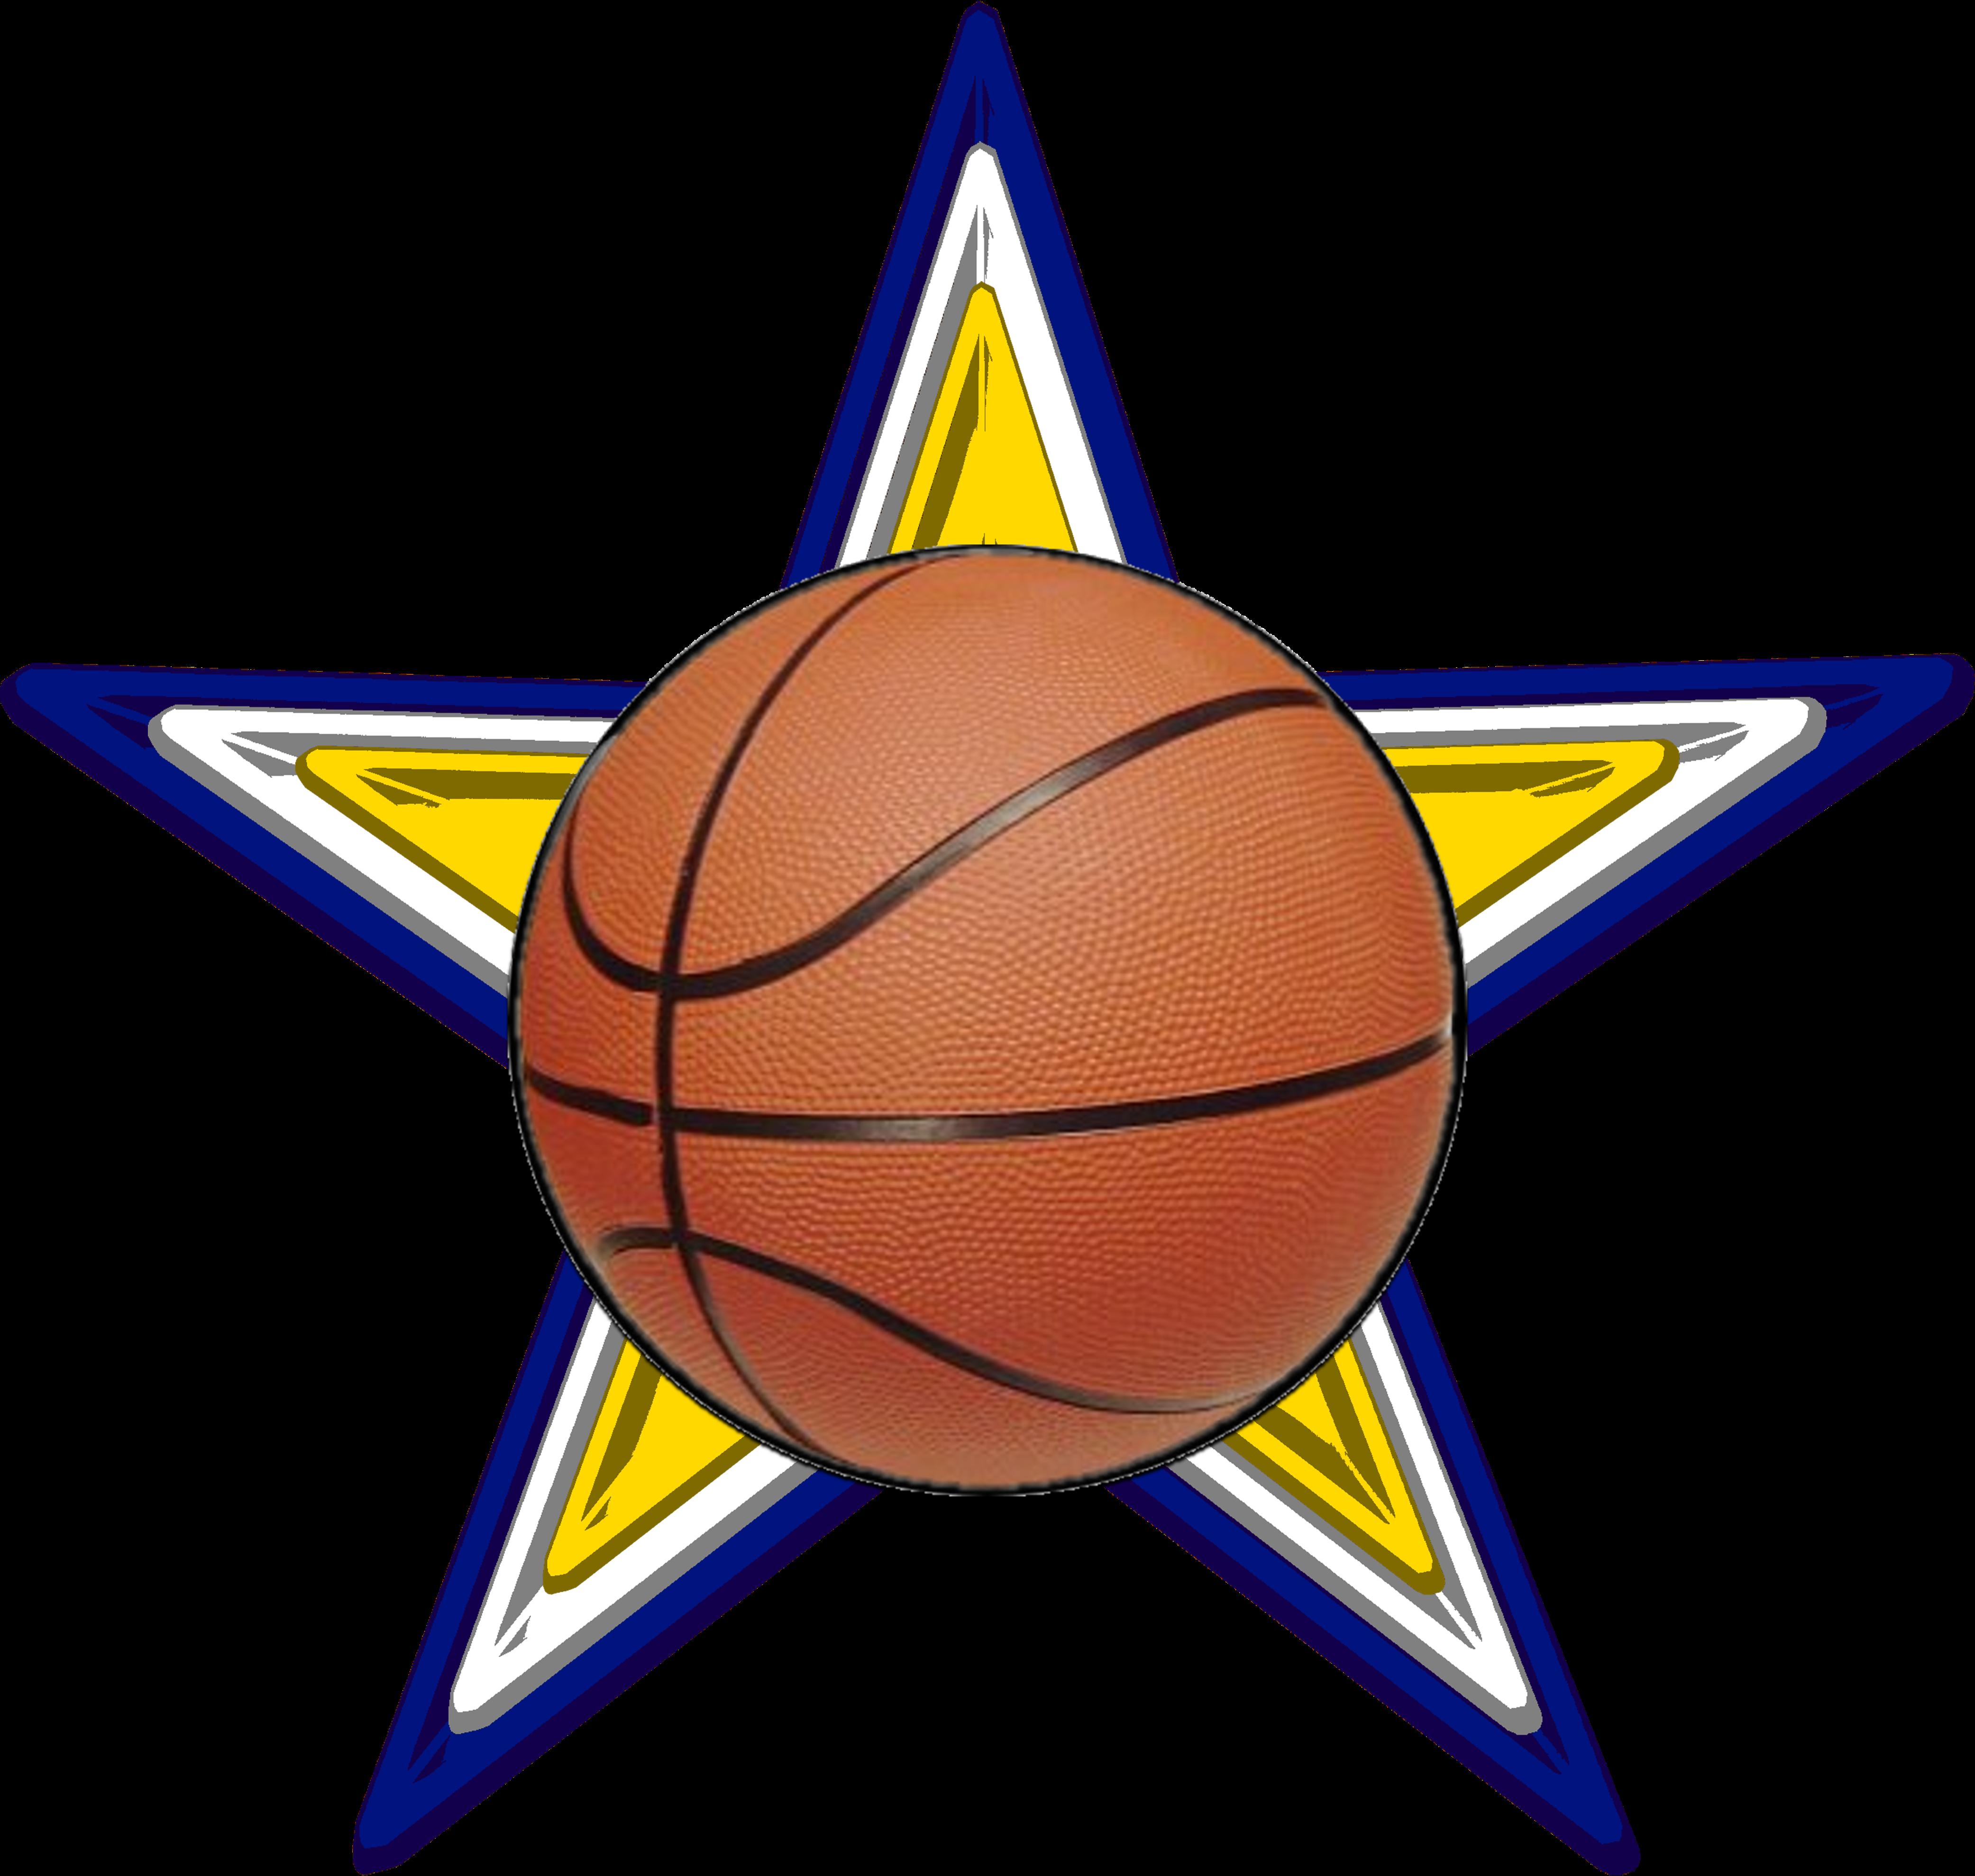 Basketball Basket Png image #39954